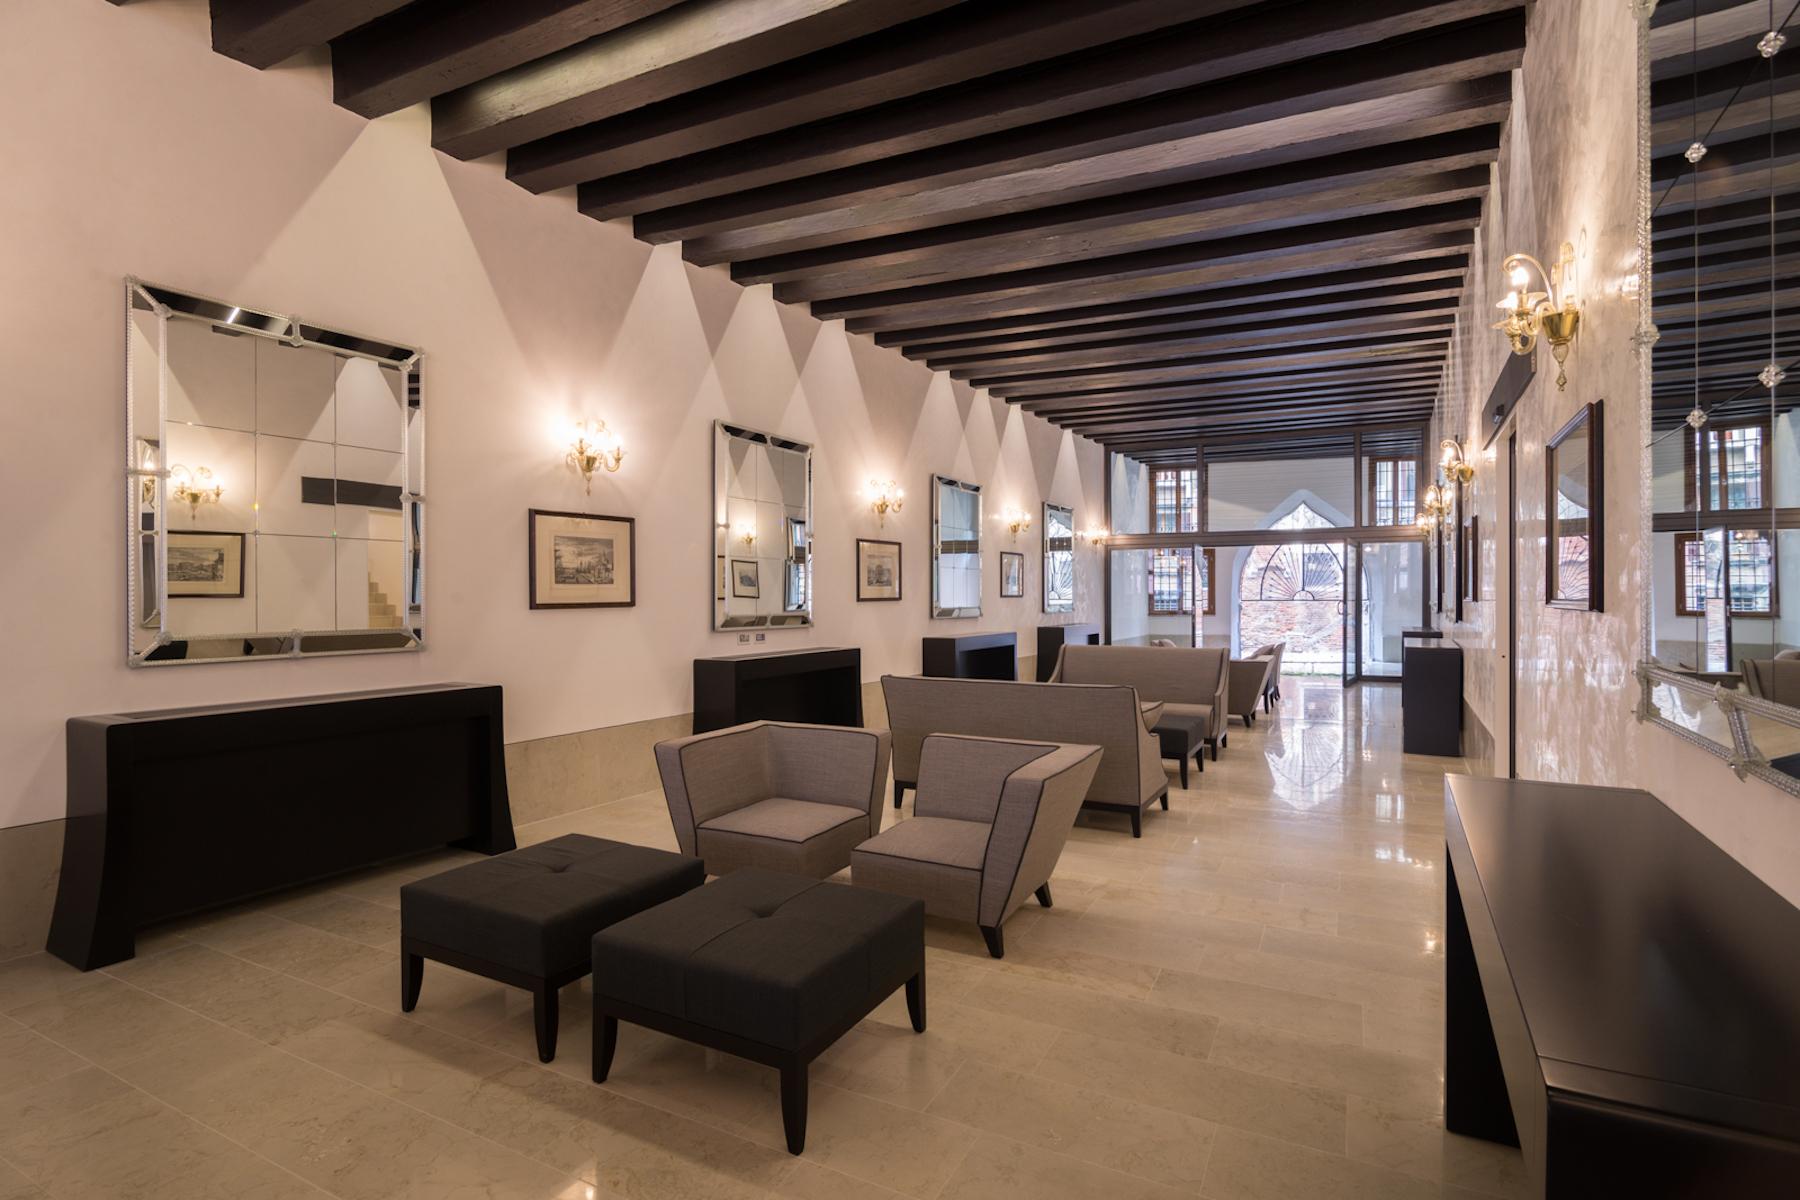 Additional photo for property listing at Mantegna Palazzo Molin del Cuoridoro San Marco Venice, Venice Italy